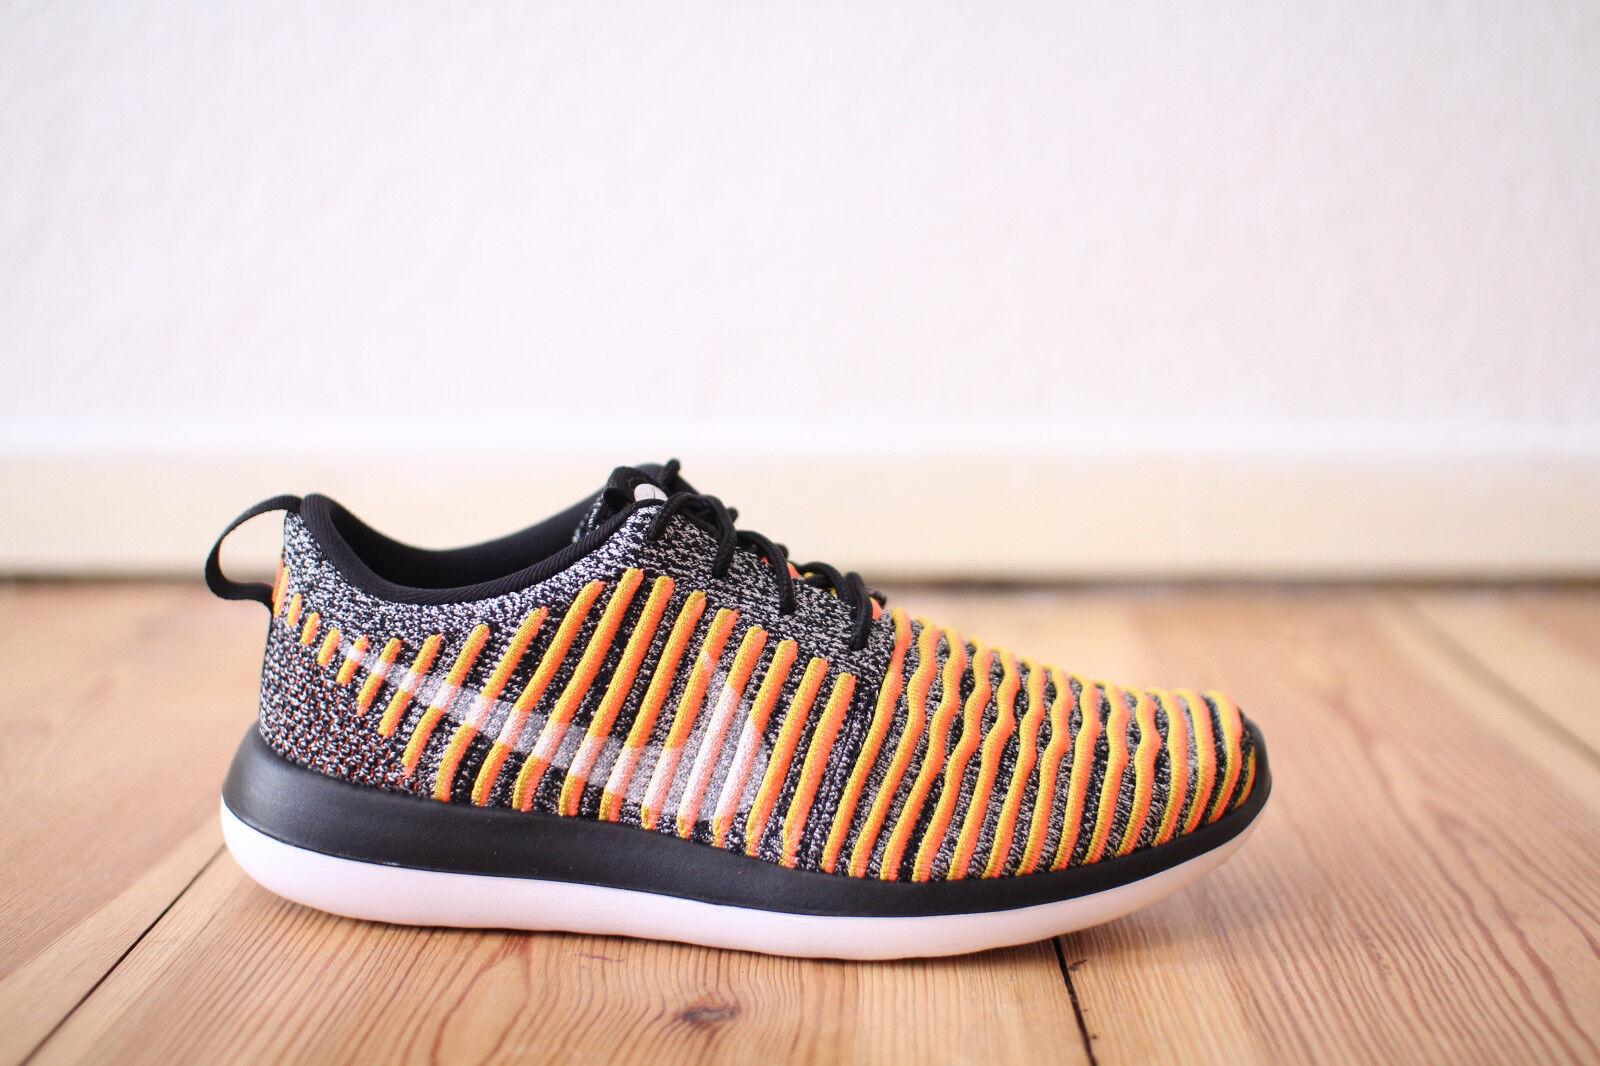 Nike Roshe Run Two Flyknit WMNS Schwarz Orange Weiß Gr. 38,39 NEU & OVP One